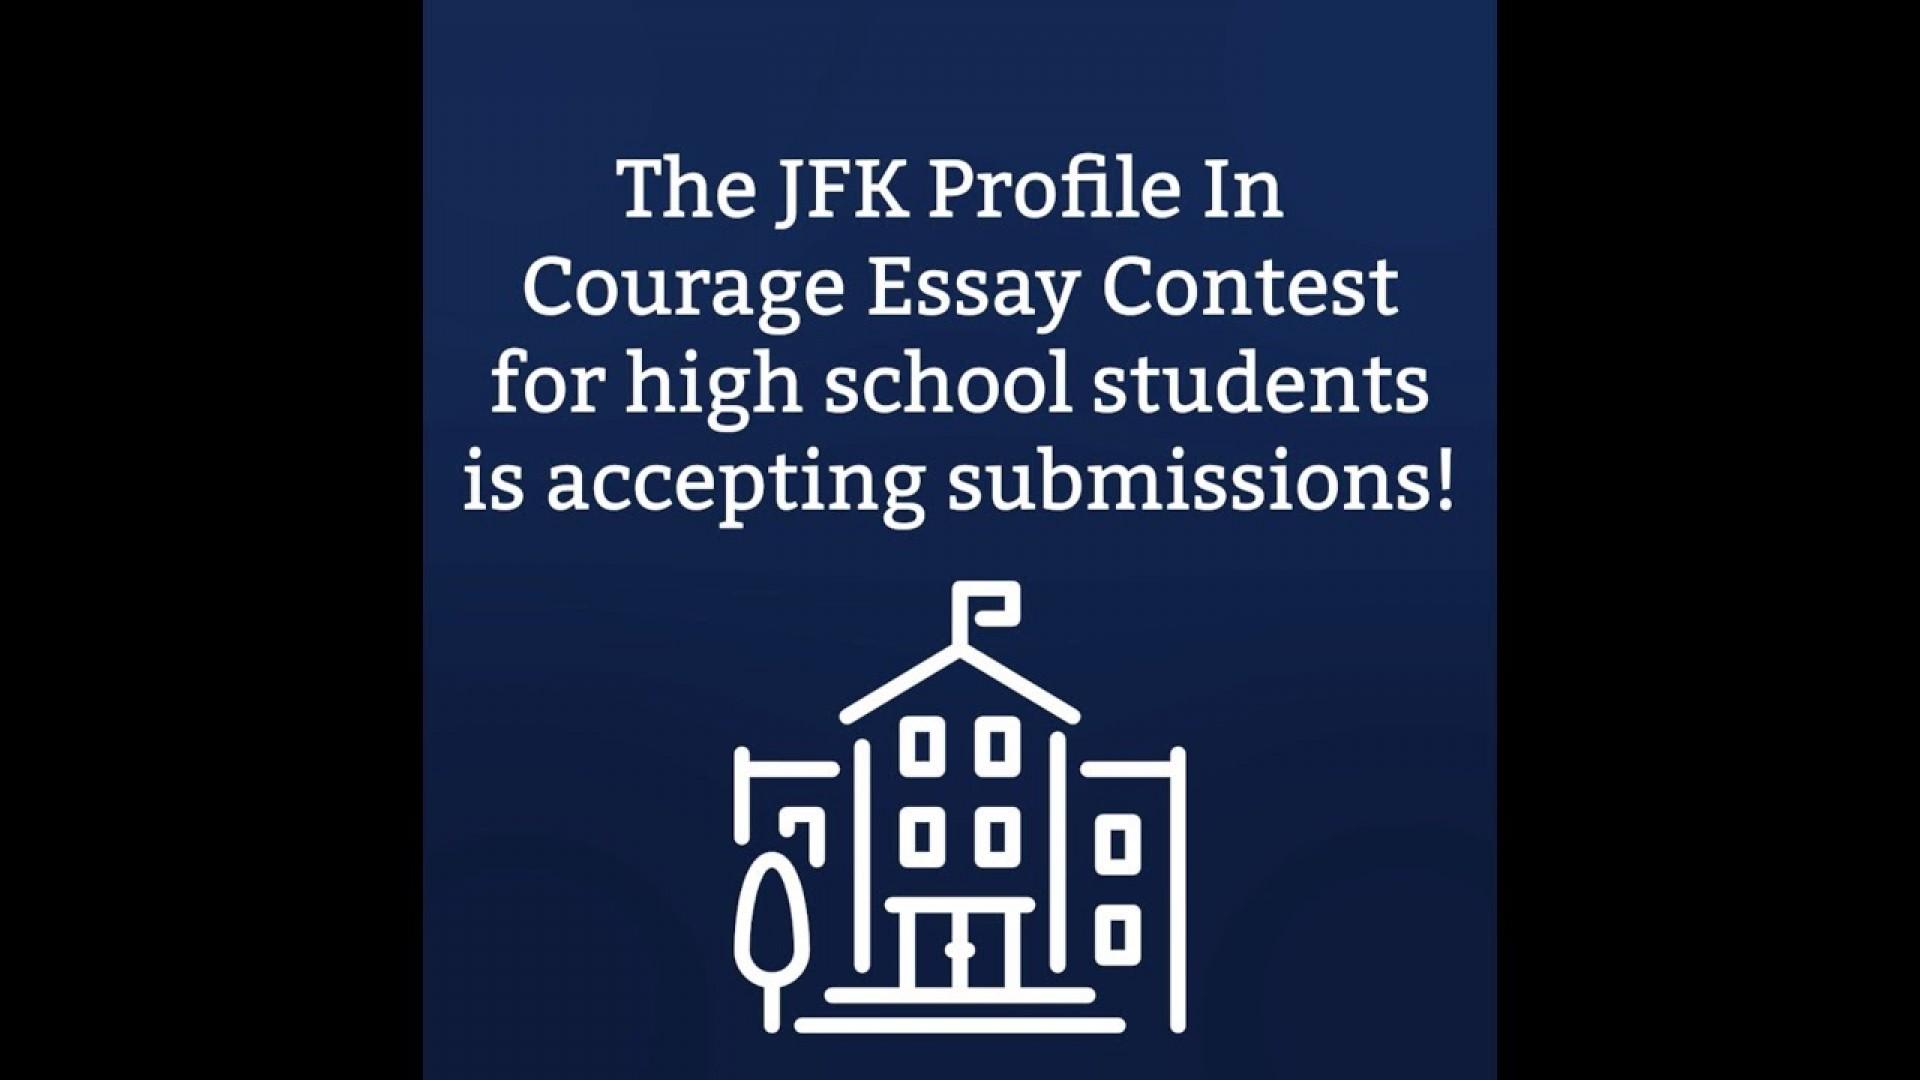 006 Jfk Essay Contest Maxresdefault Impressive Winners Requirements 1920